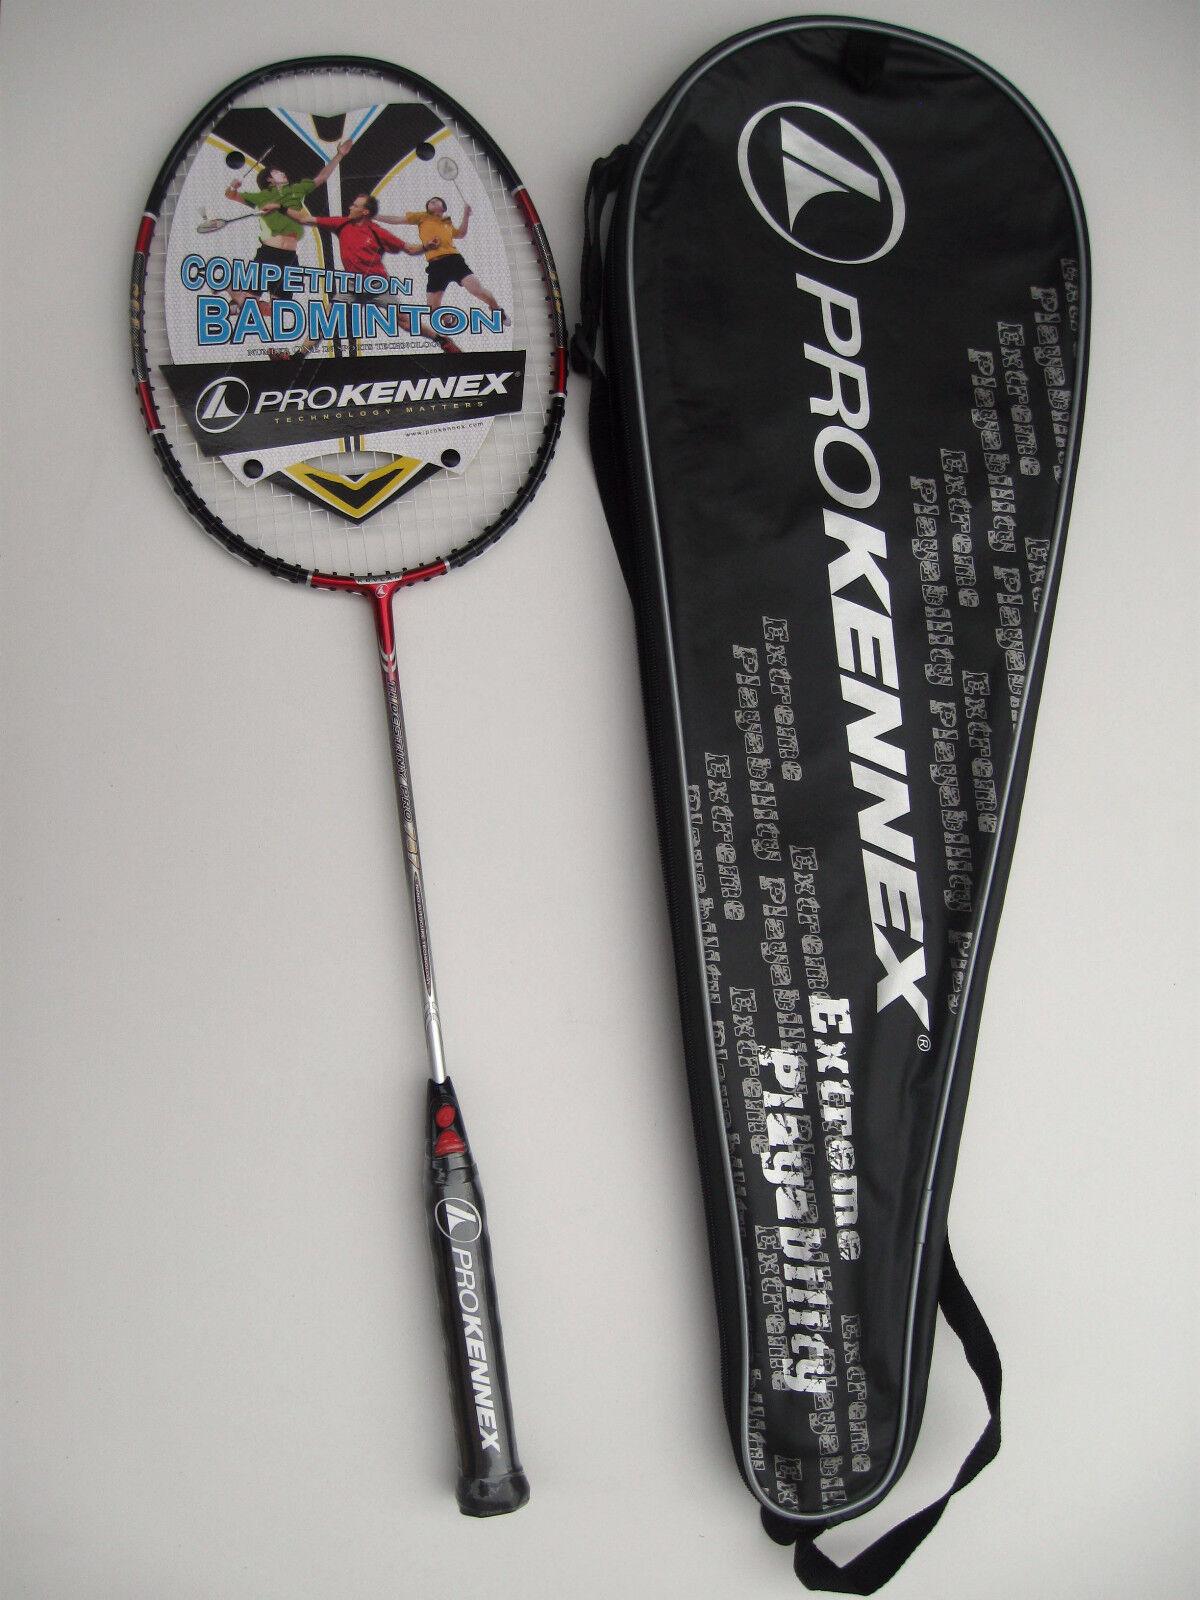 PRO PRO PRO KENNEX DESTINY 787 Racchetta da badminton cdfe6f